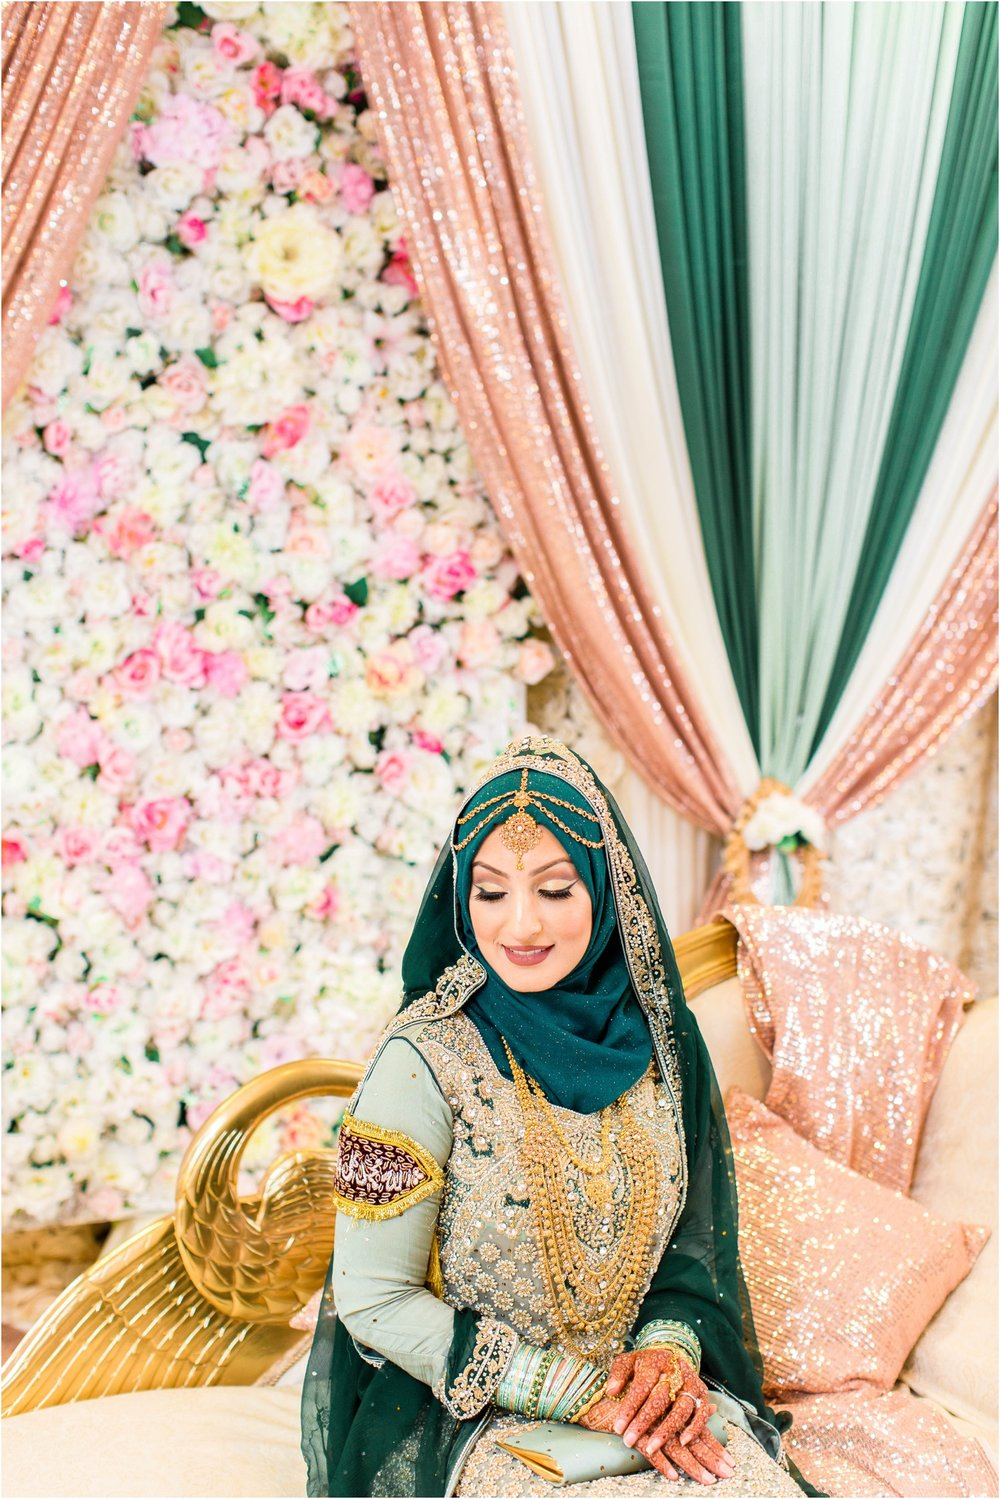 Best-of-2017-Weddings-Toronto-Mississauga-Brampton-Scarborough-GTA-Pakistani-Indian-Wedding-Engagement-Photographer-Photography_0055.jpg